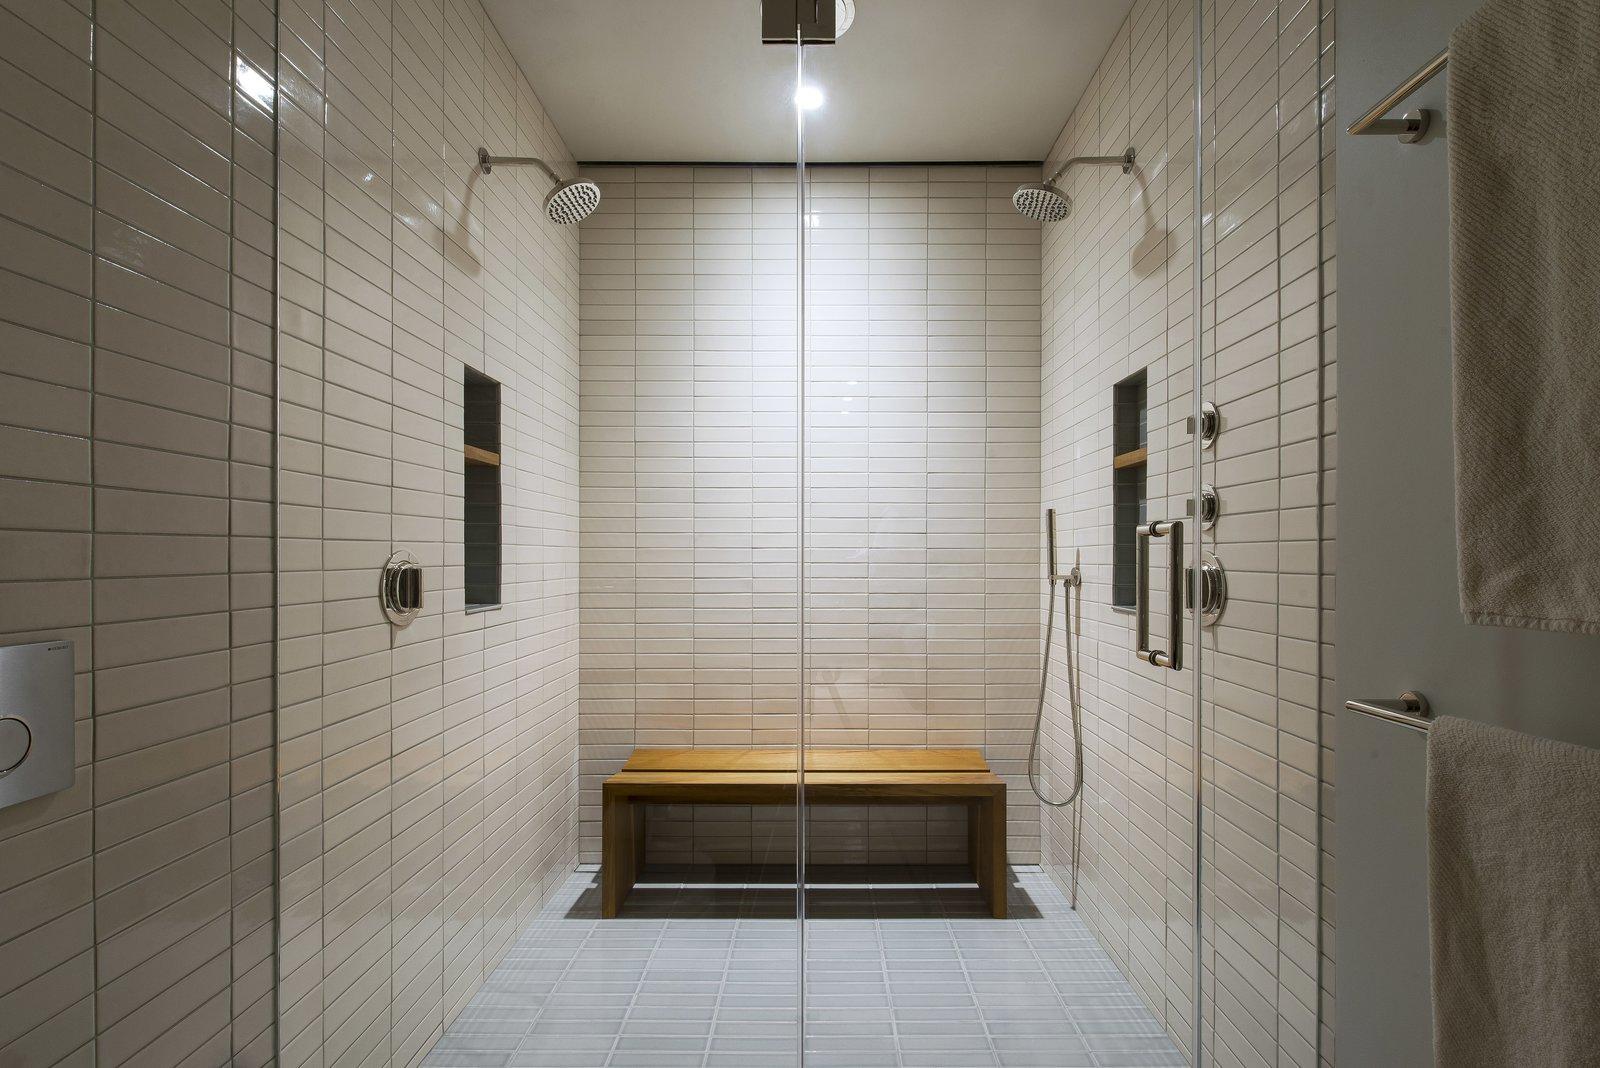 Master Bathroom - Shower  Nob Hill Residence by Imbue Design